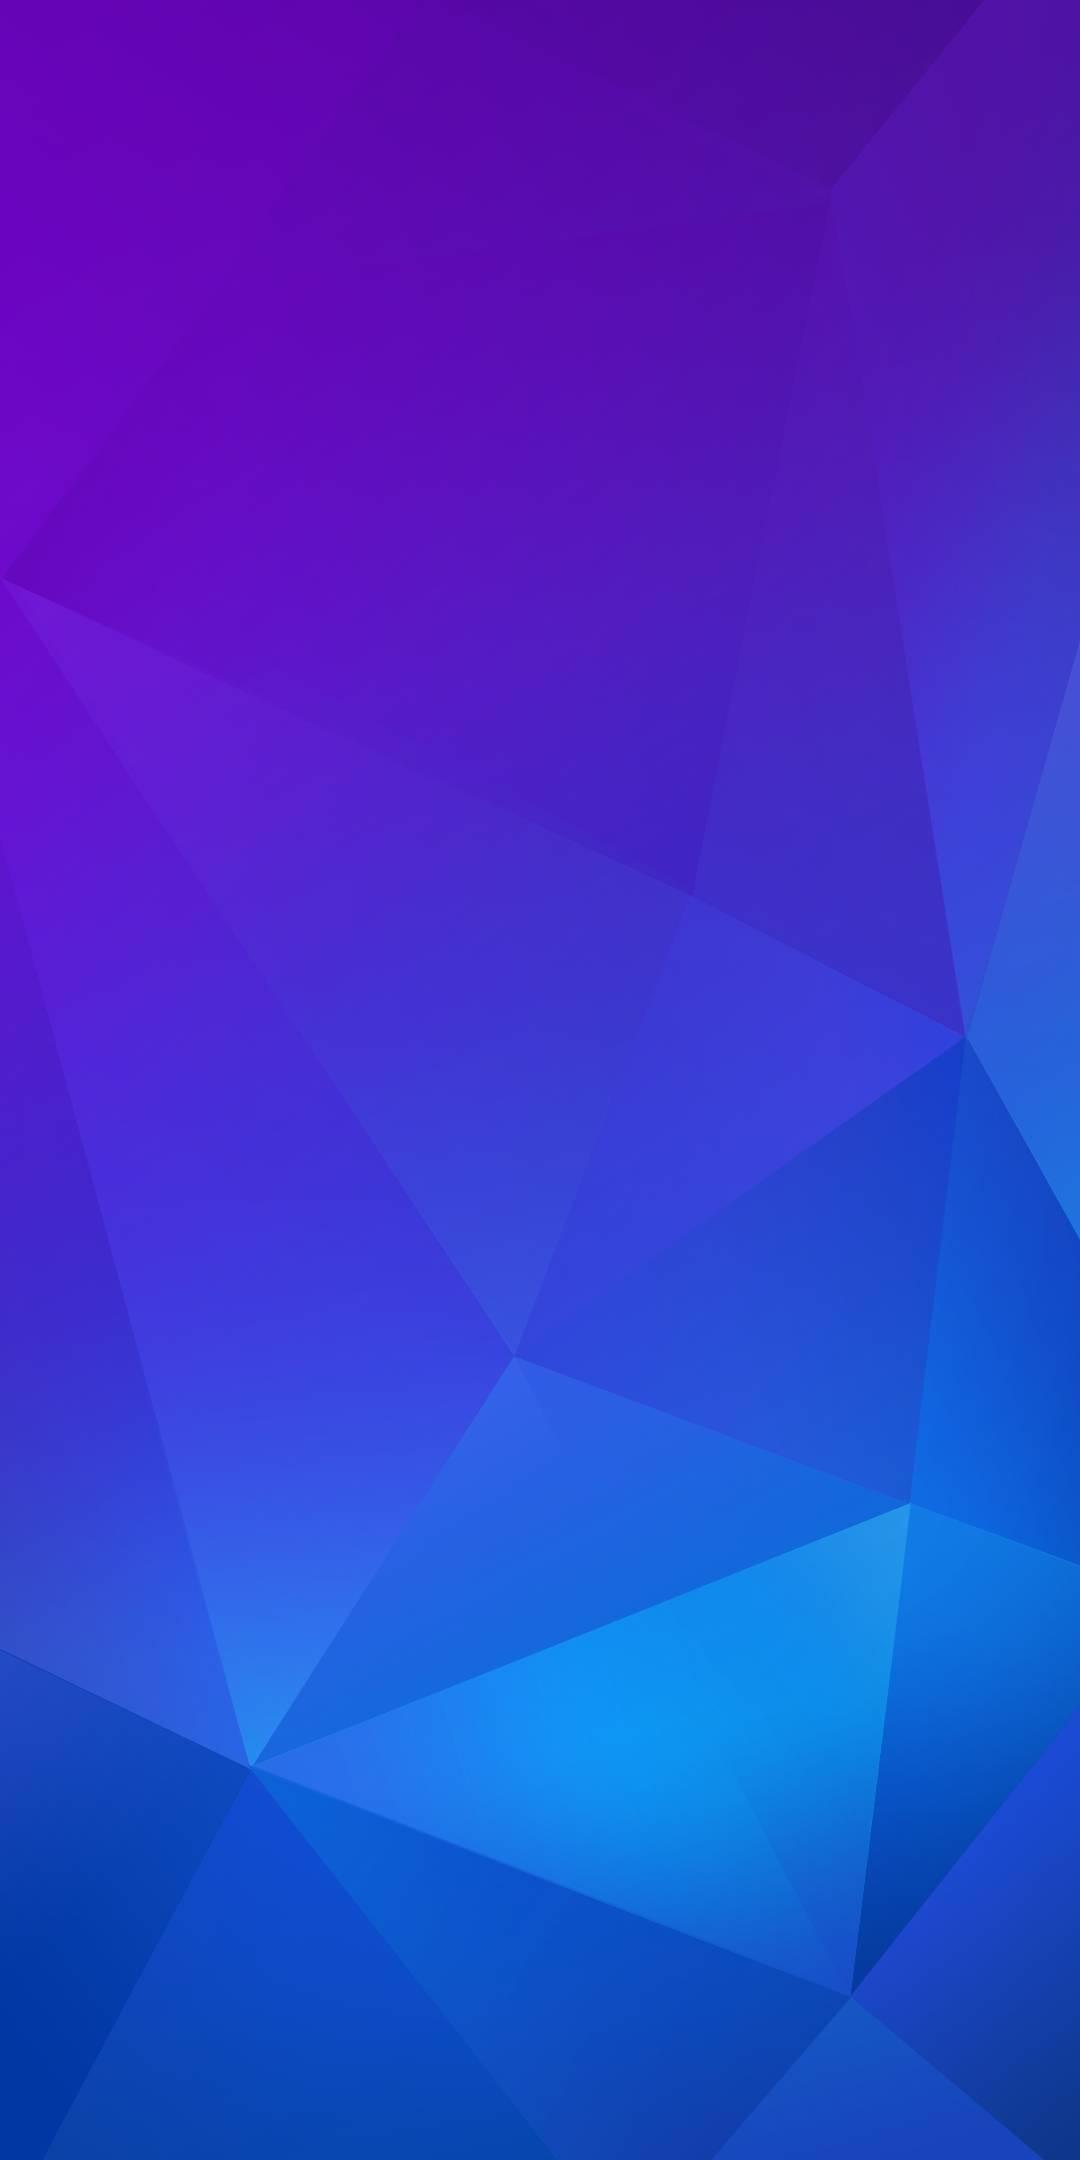 Oppo Realme Stock Wallpaper 06 - [1080x2160]